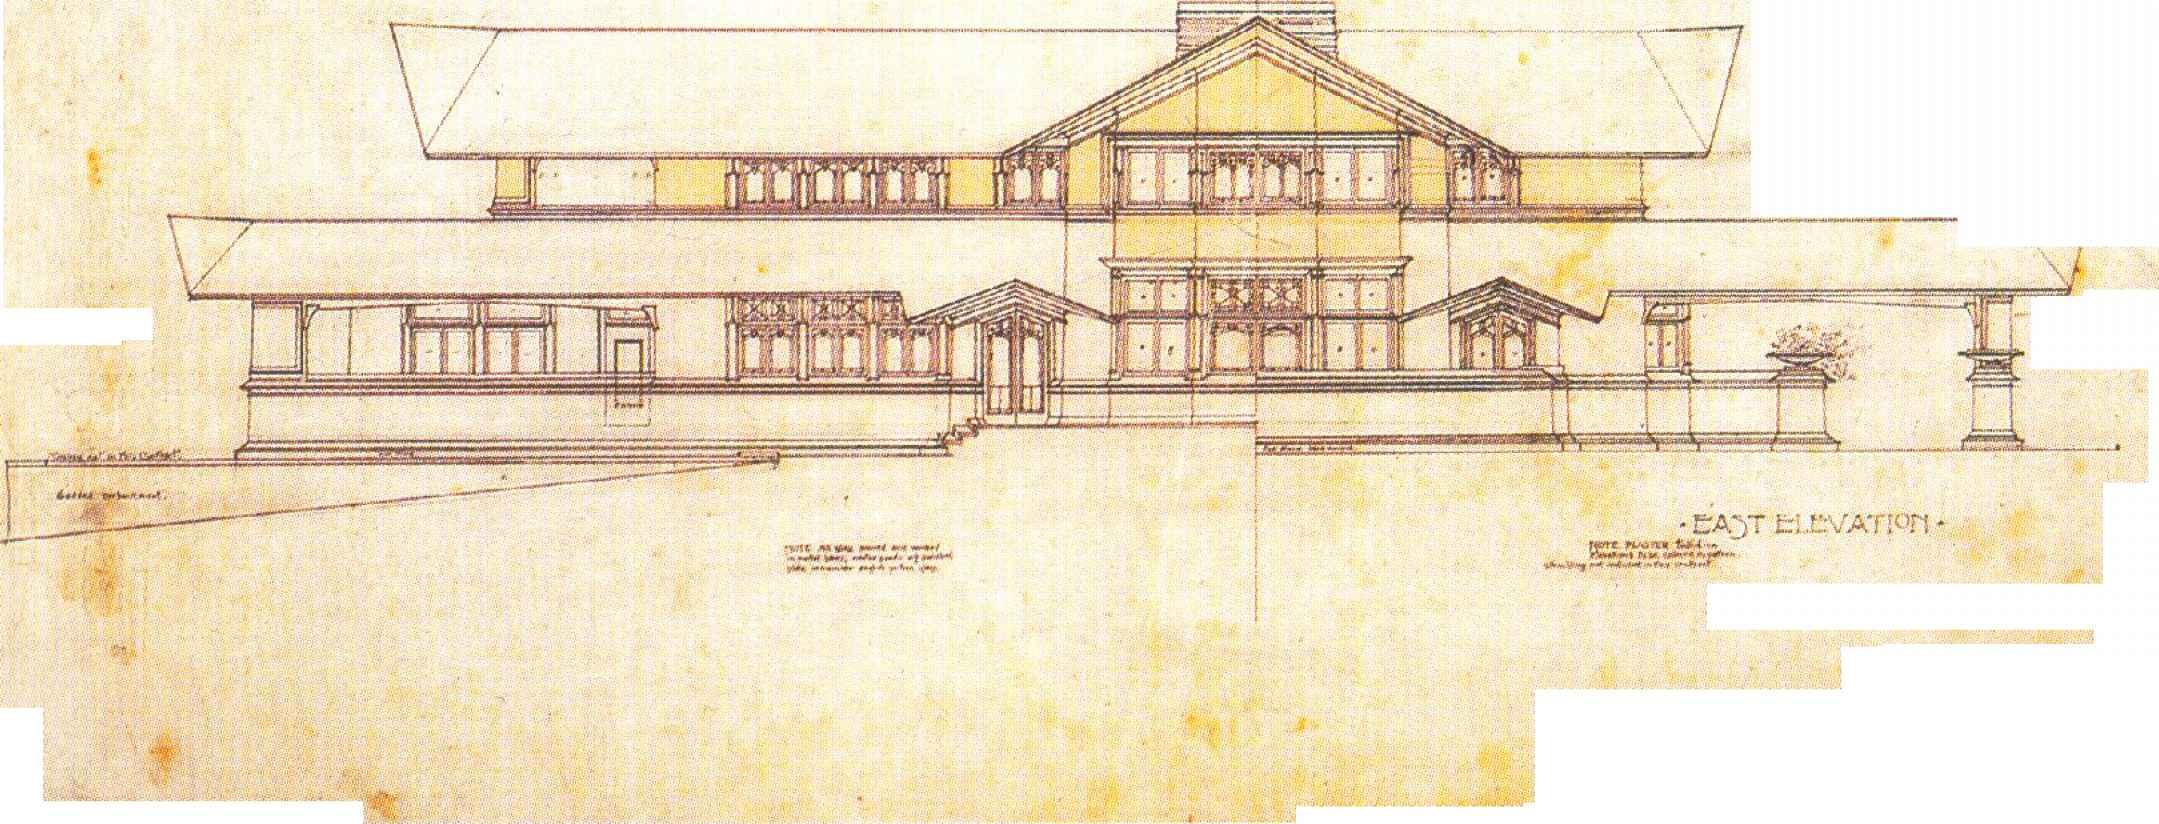 Frank Lloyd Wright Flooring : Frank lloyd wright northome floor plans